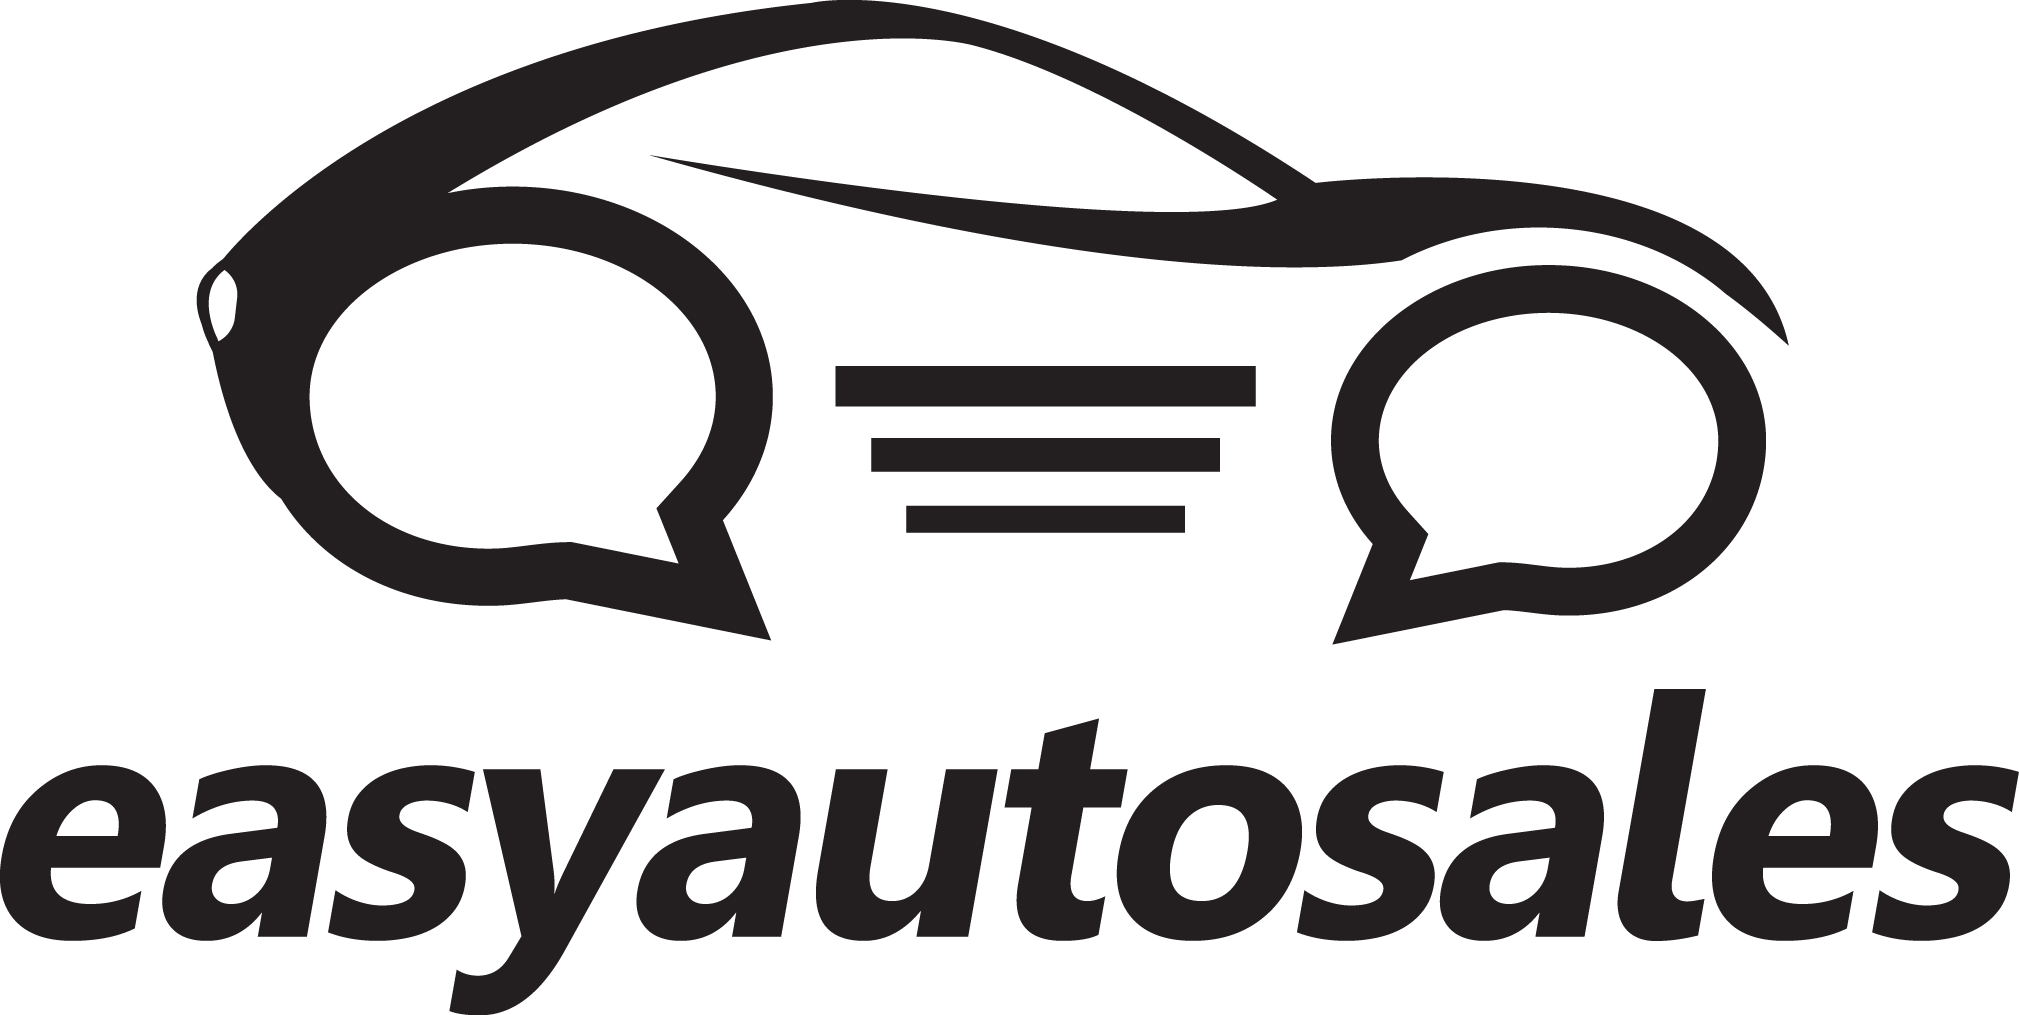 Create an iconic logo for EasyAutoSales.com